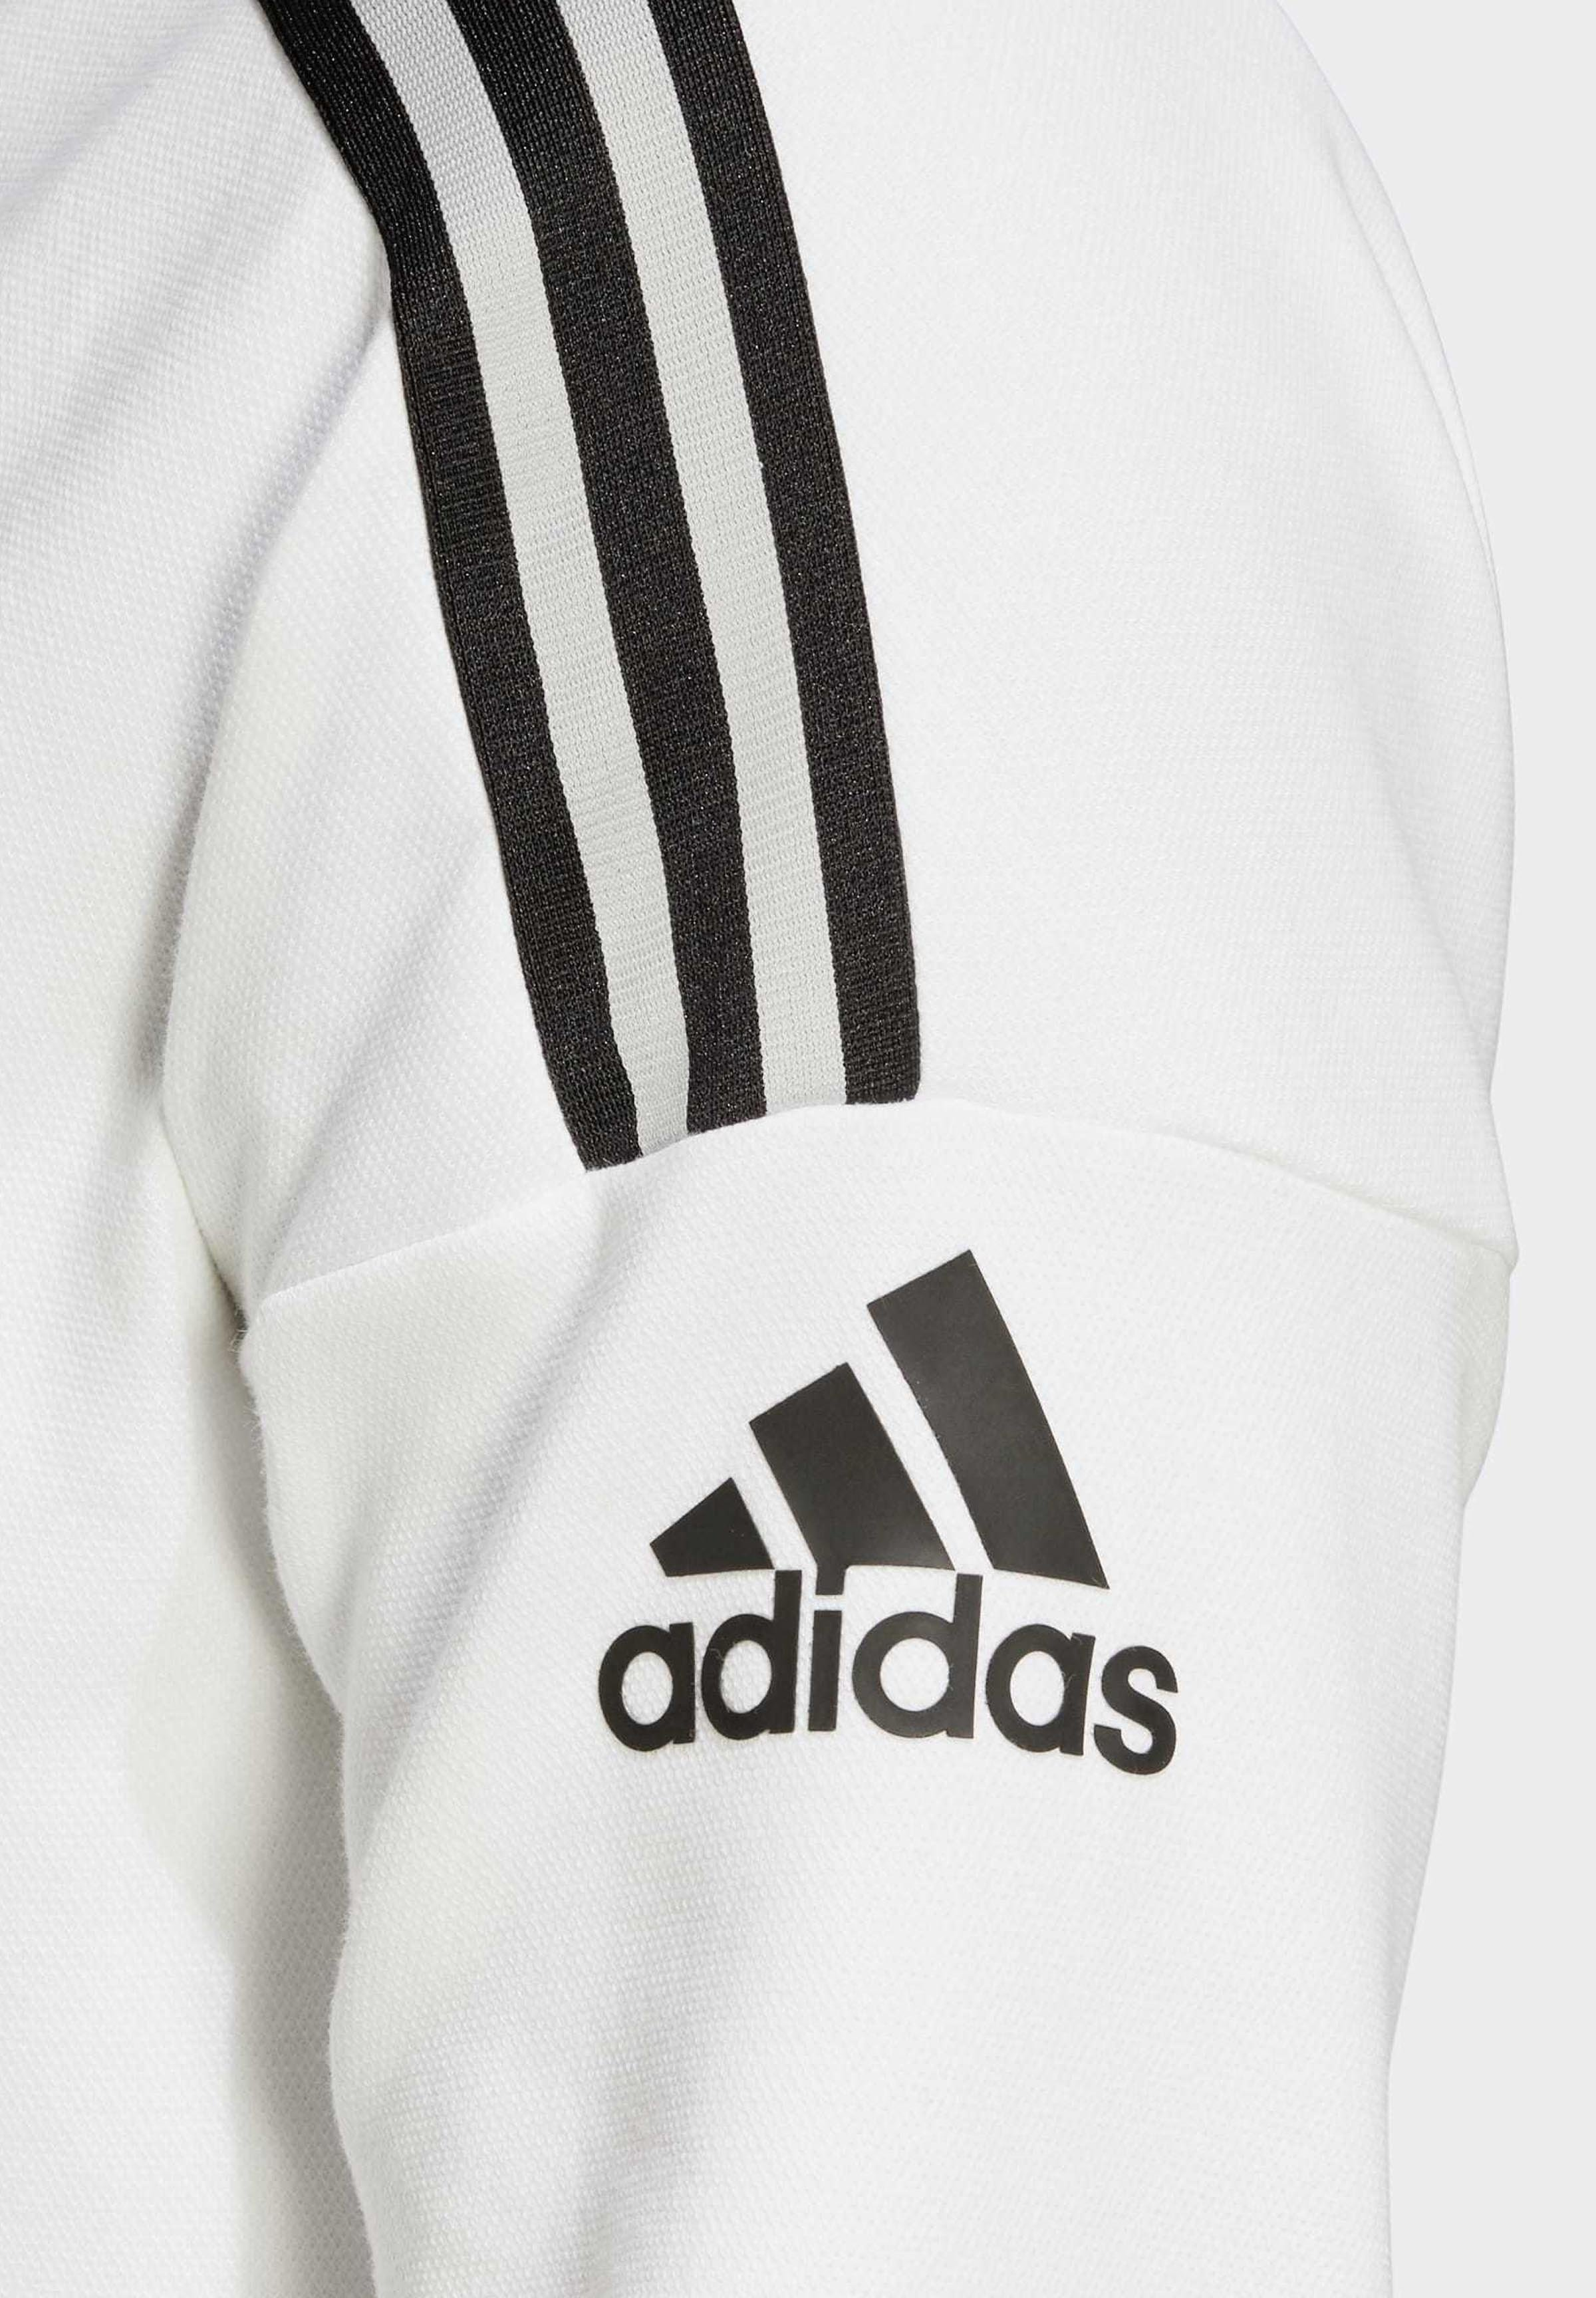 Adidas Performance Z.n.e. 3-stripes Hoodie - Met Rits White